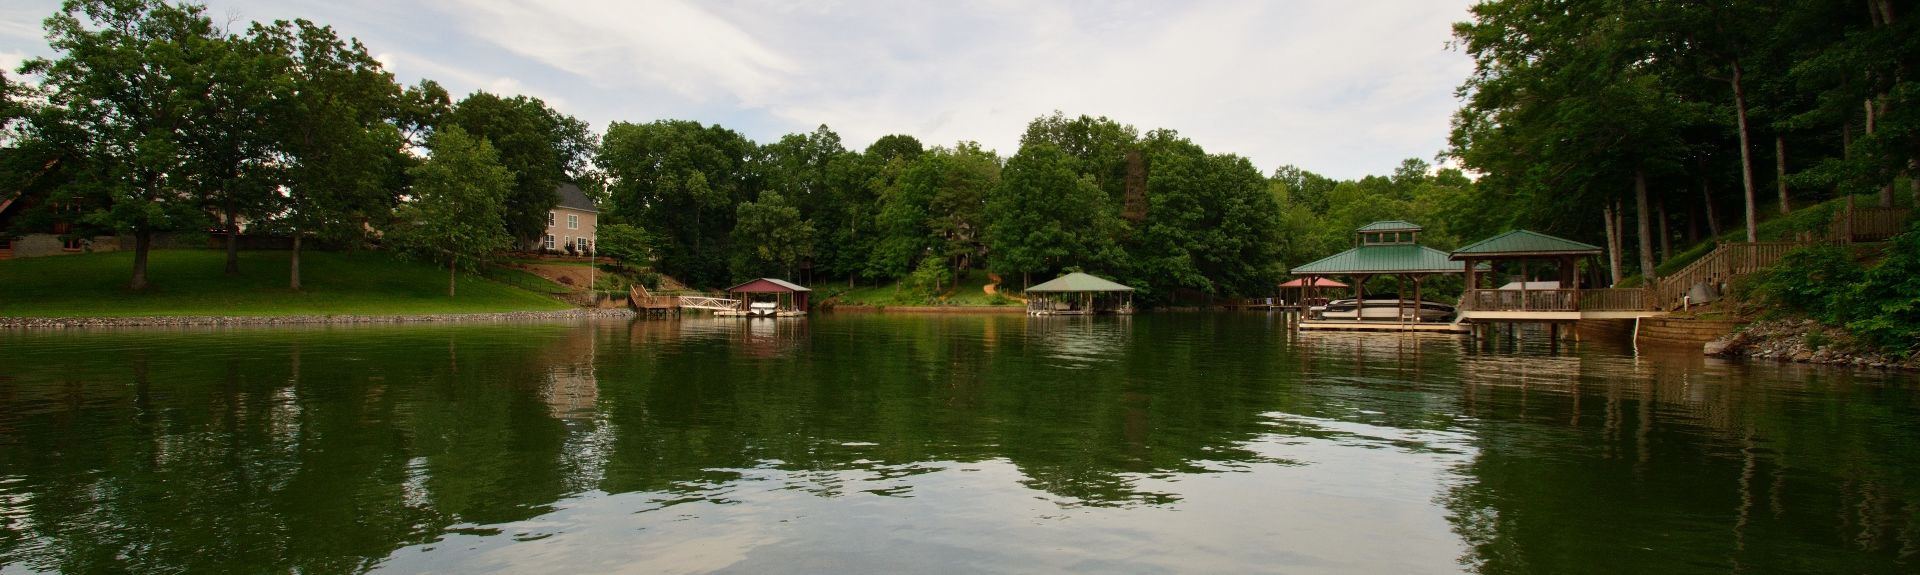 Jetton Park, Cornelius, North Carolina, United States